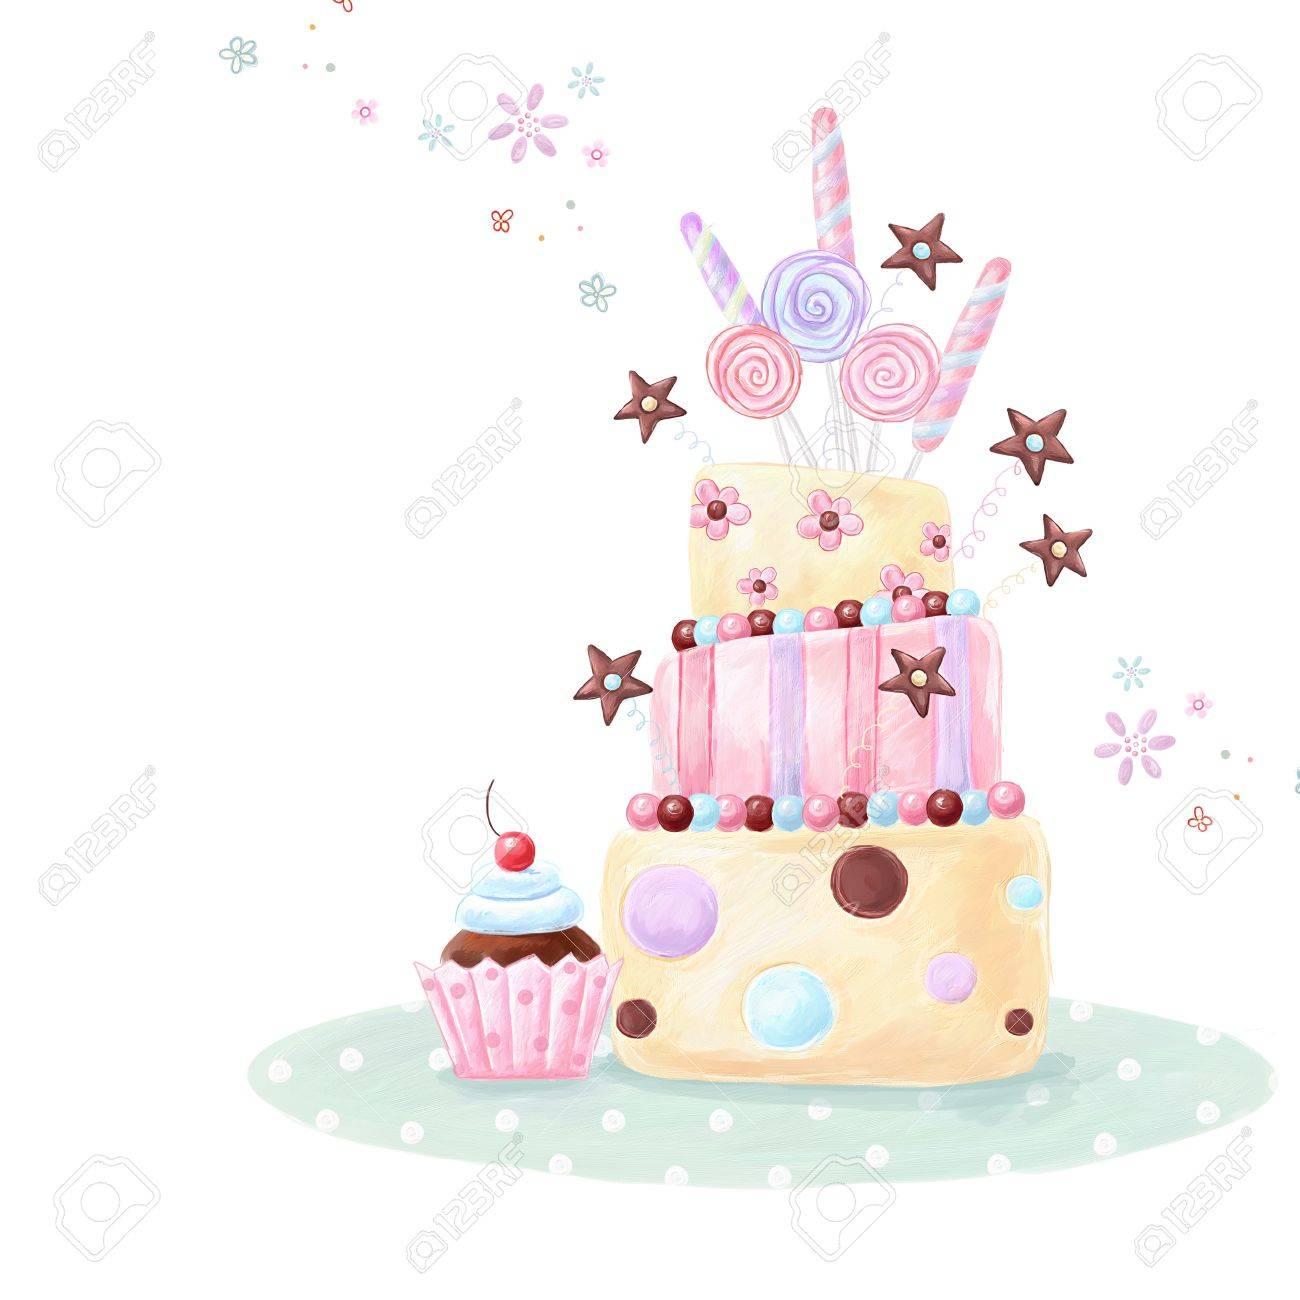 Tea Time Template Design Illustration Made Of Birthday Cake